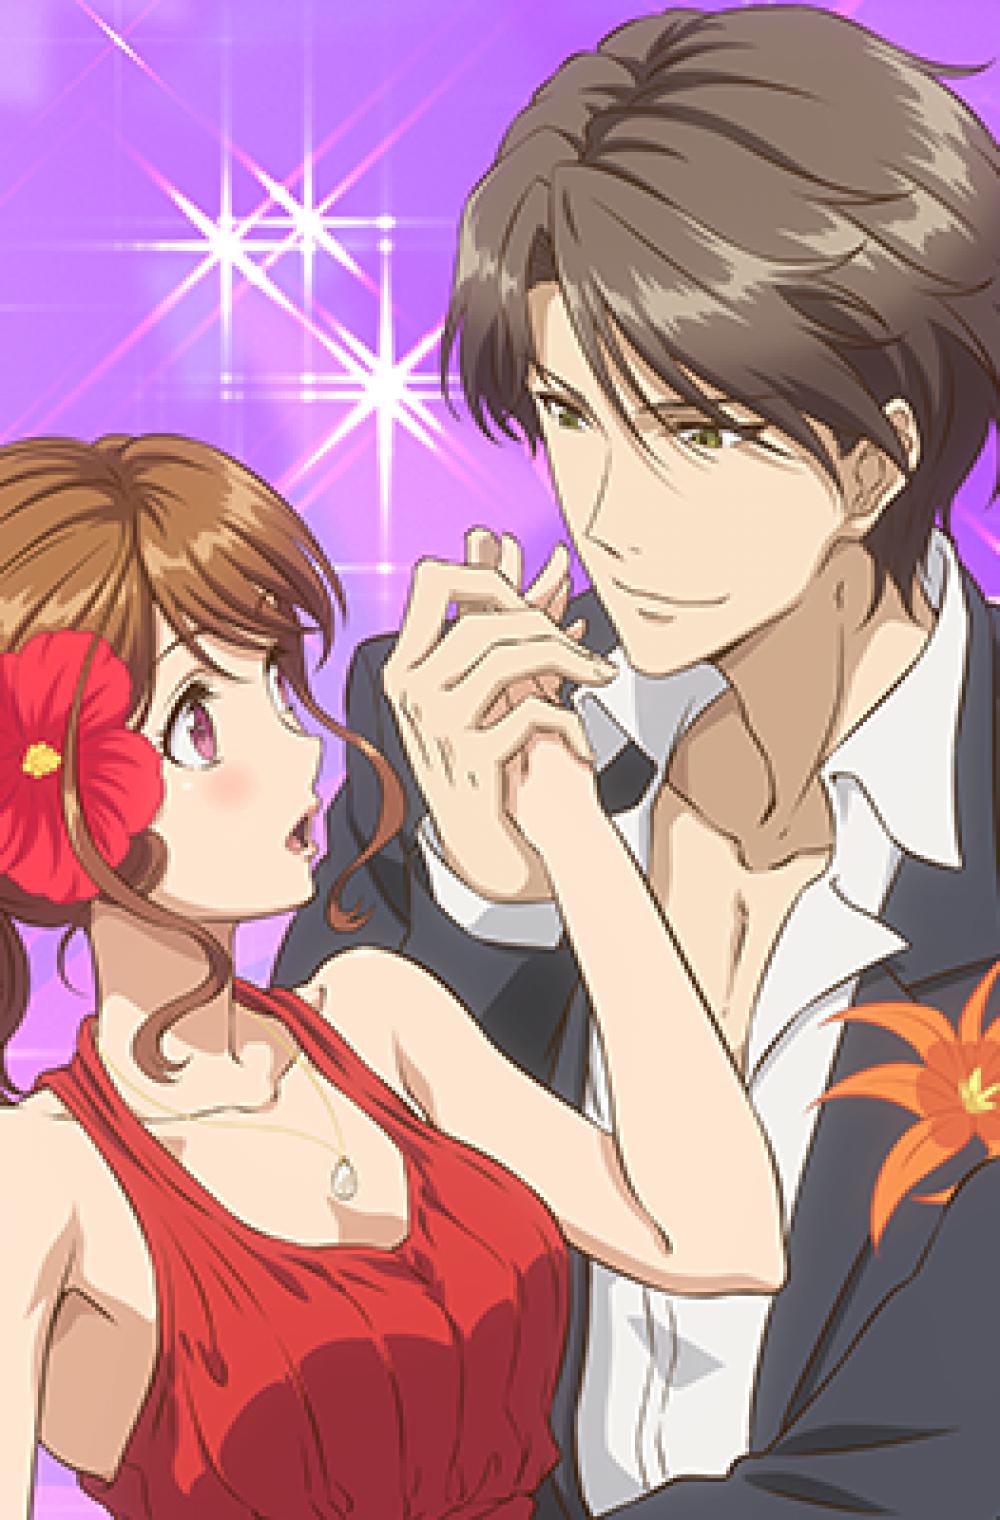 (UNCENSORED) Eternity Shinya no Nurekoi Channel